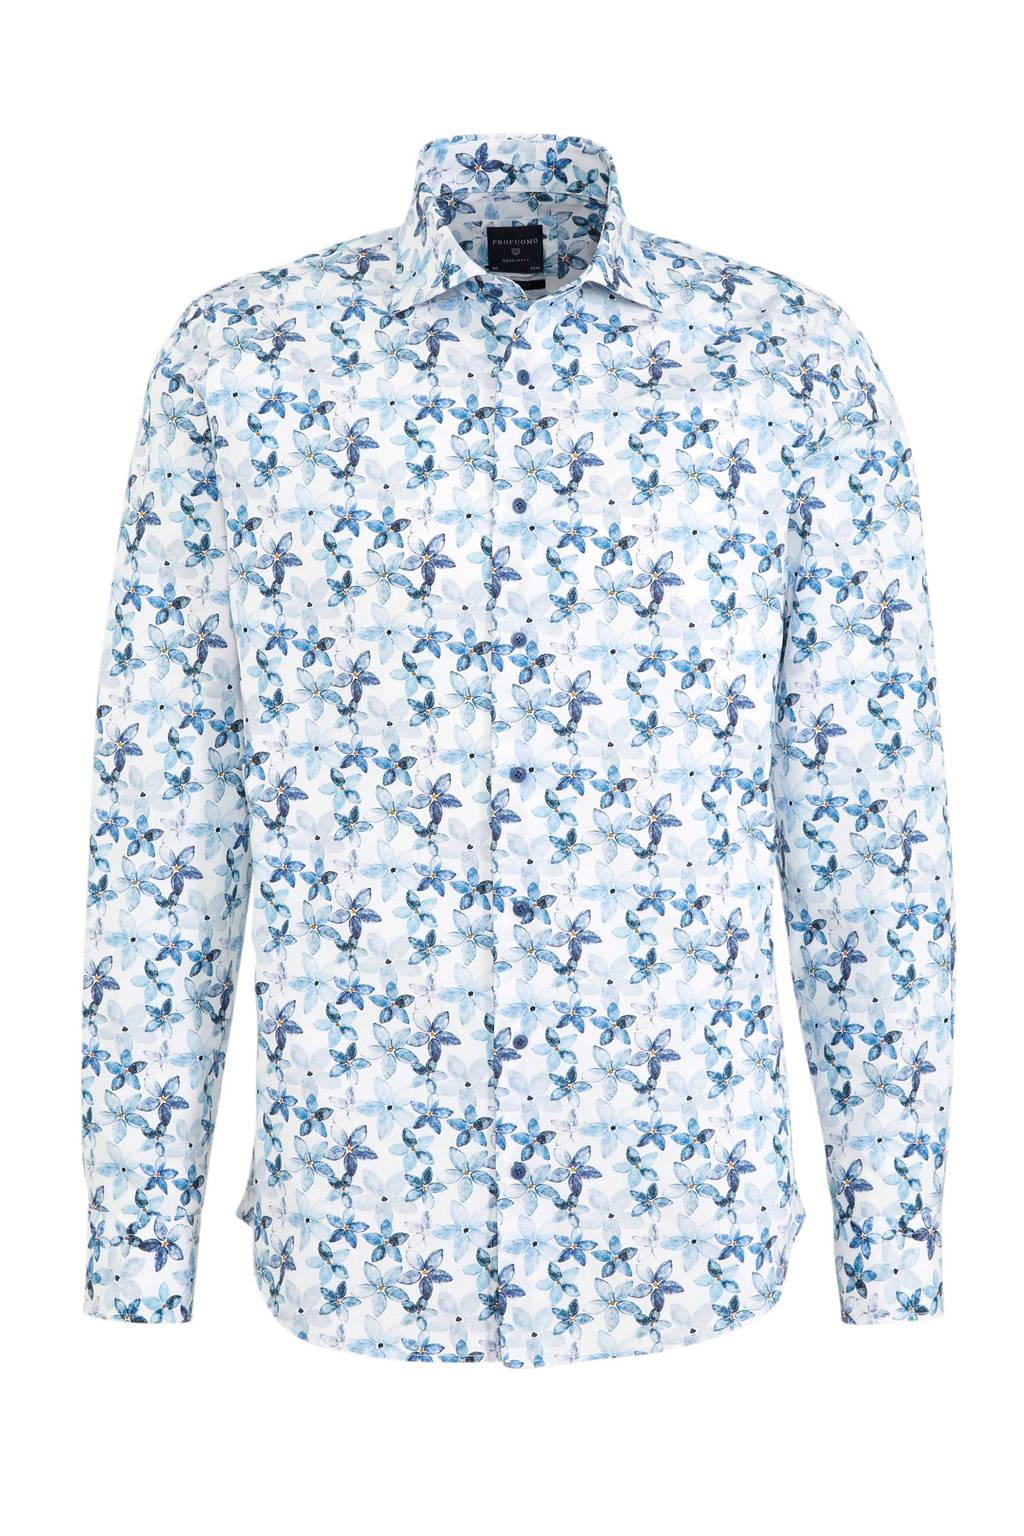 Profuomo slim fit overhemd Cutaway met all over print multi, Multi